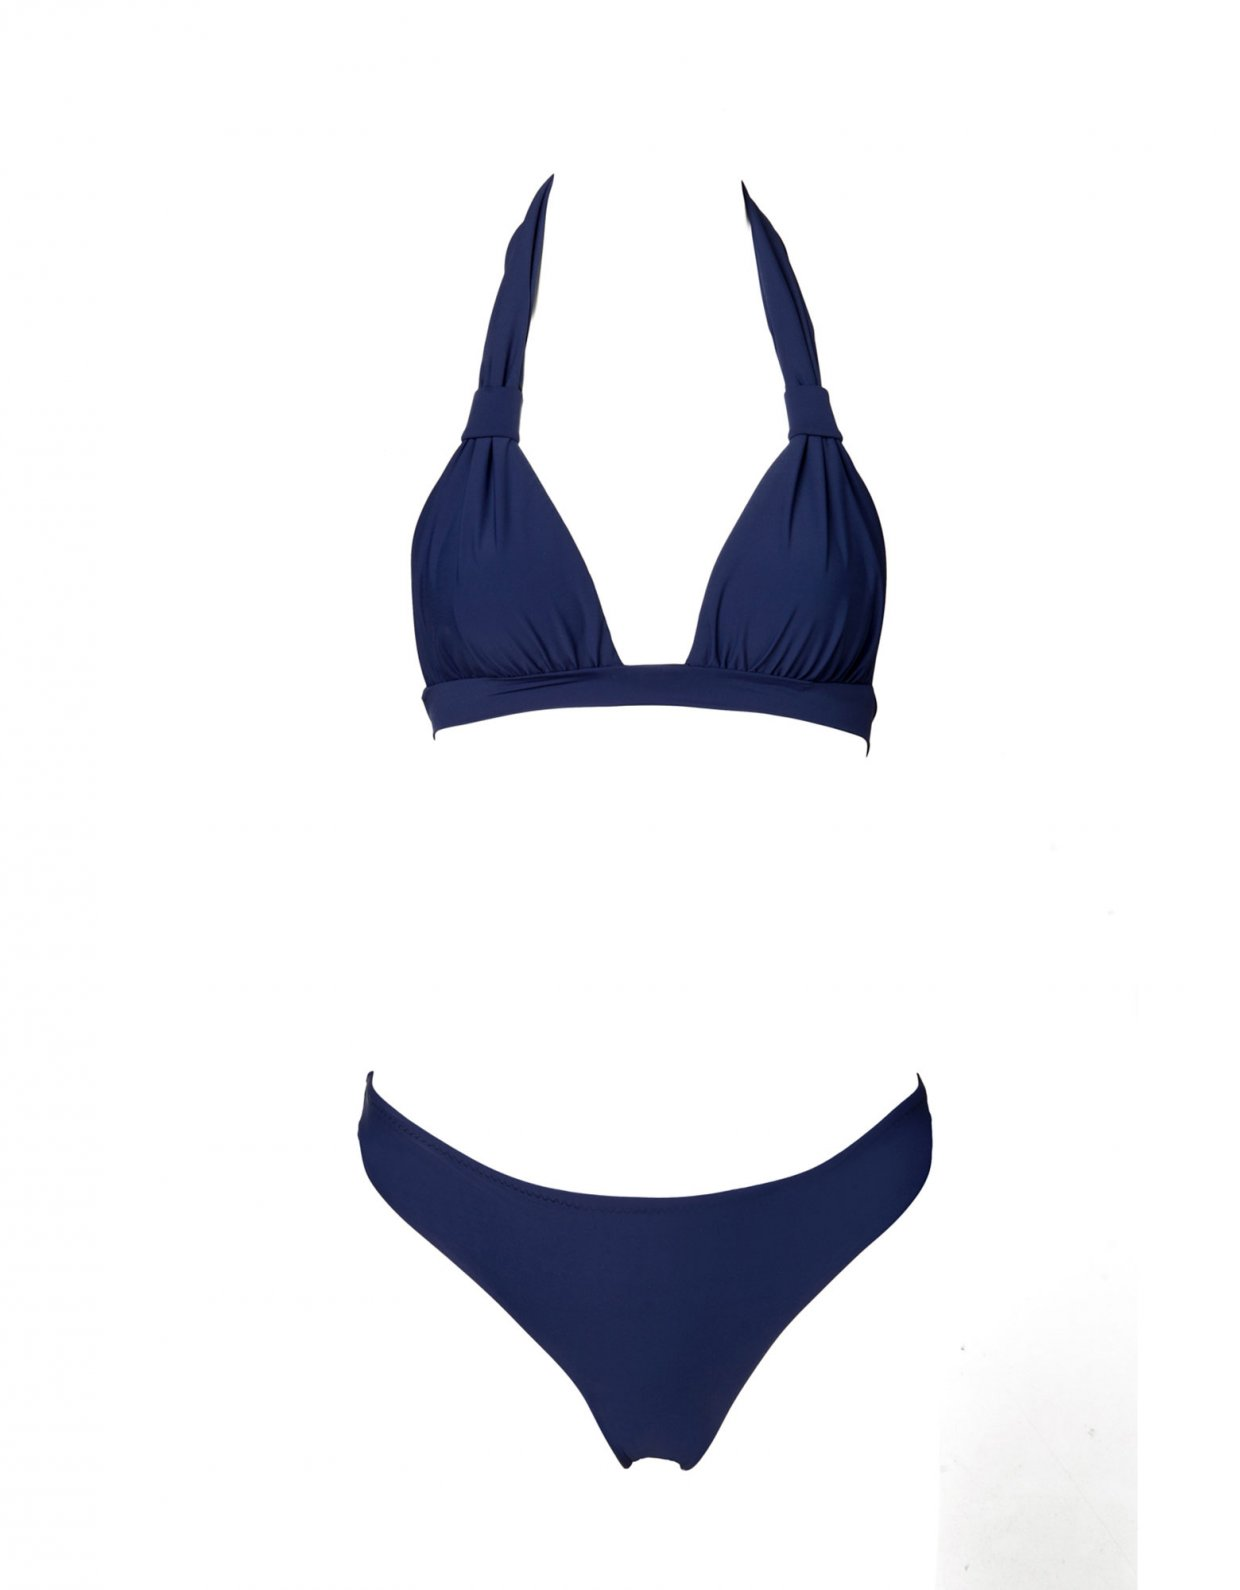 Lookseri swimwear Iris bikini patriot blue